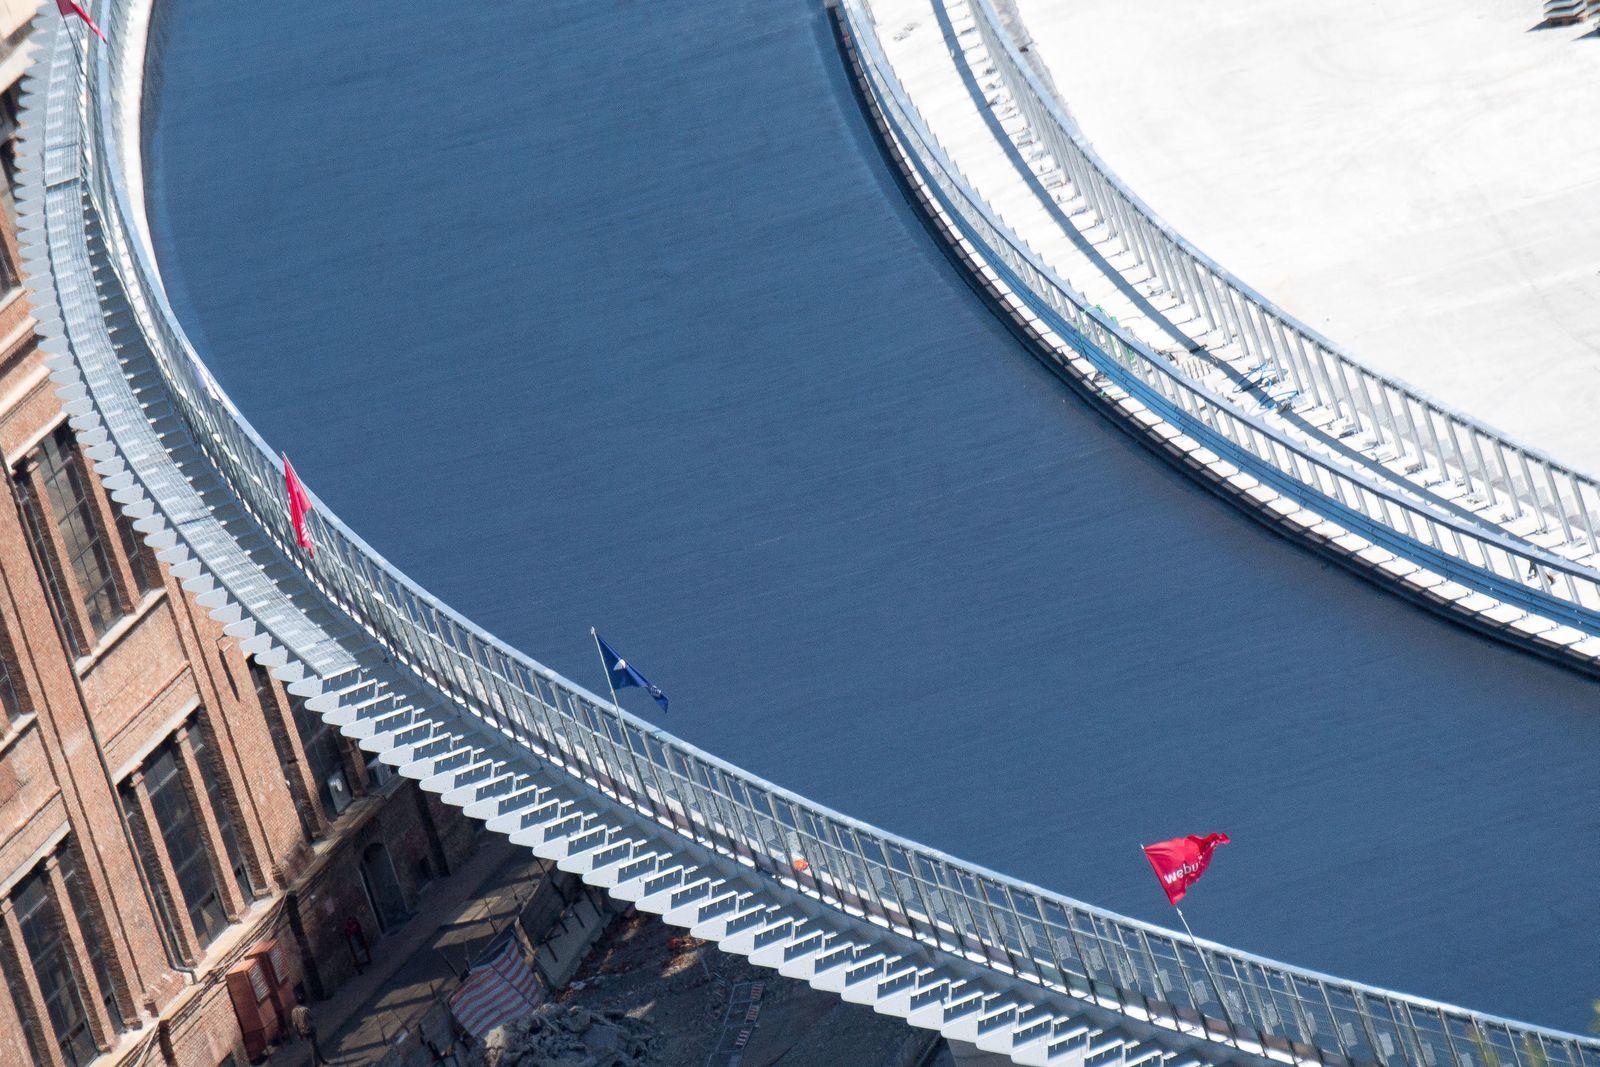 Construction progress of new Genoa bridge, Genova, Italy - 07 Jul 2020